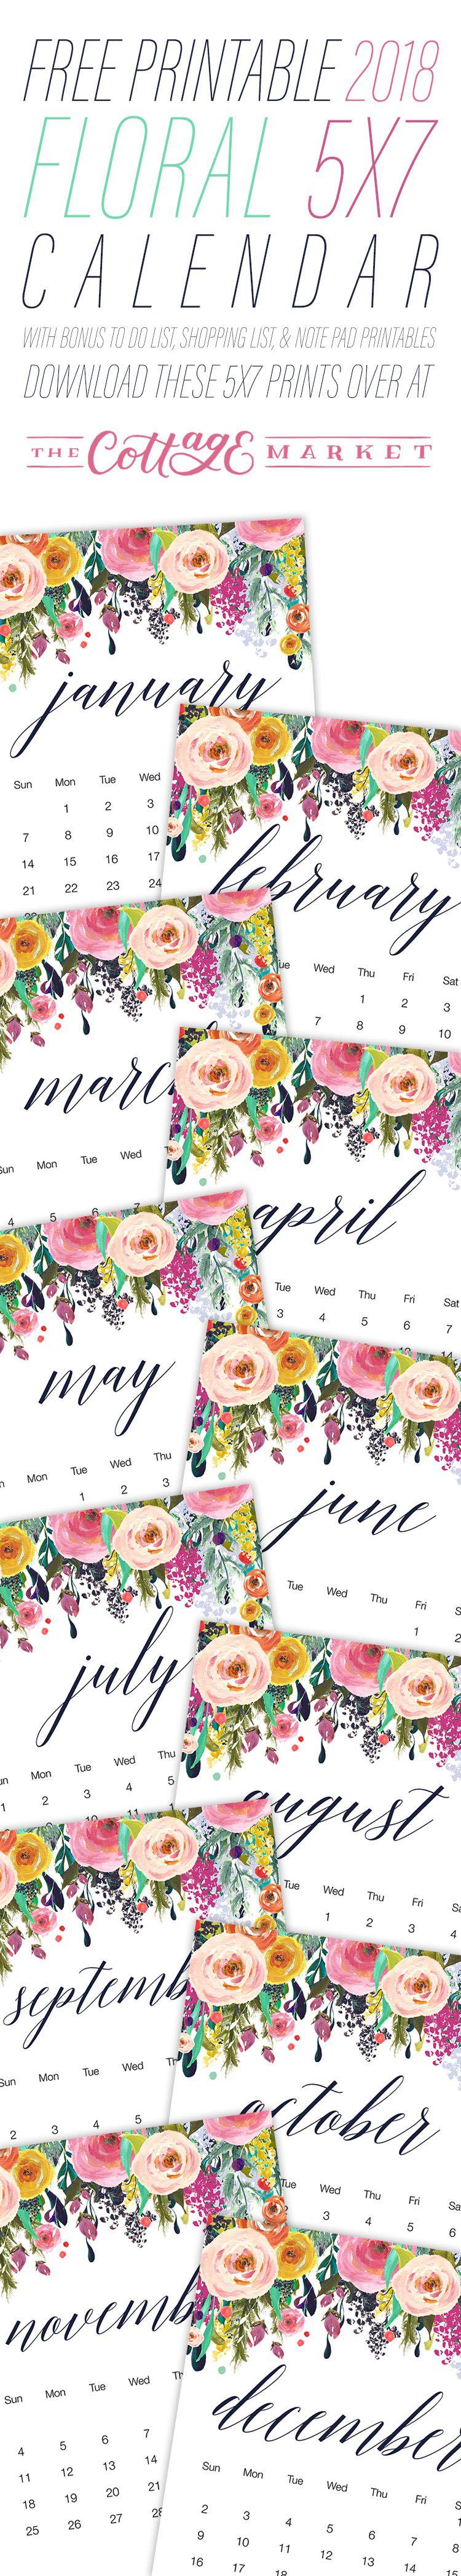 free printable 2018 floral 5x7 calendar free printable free